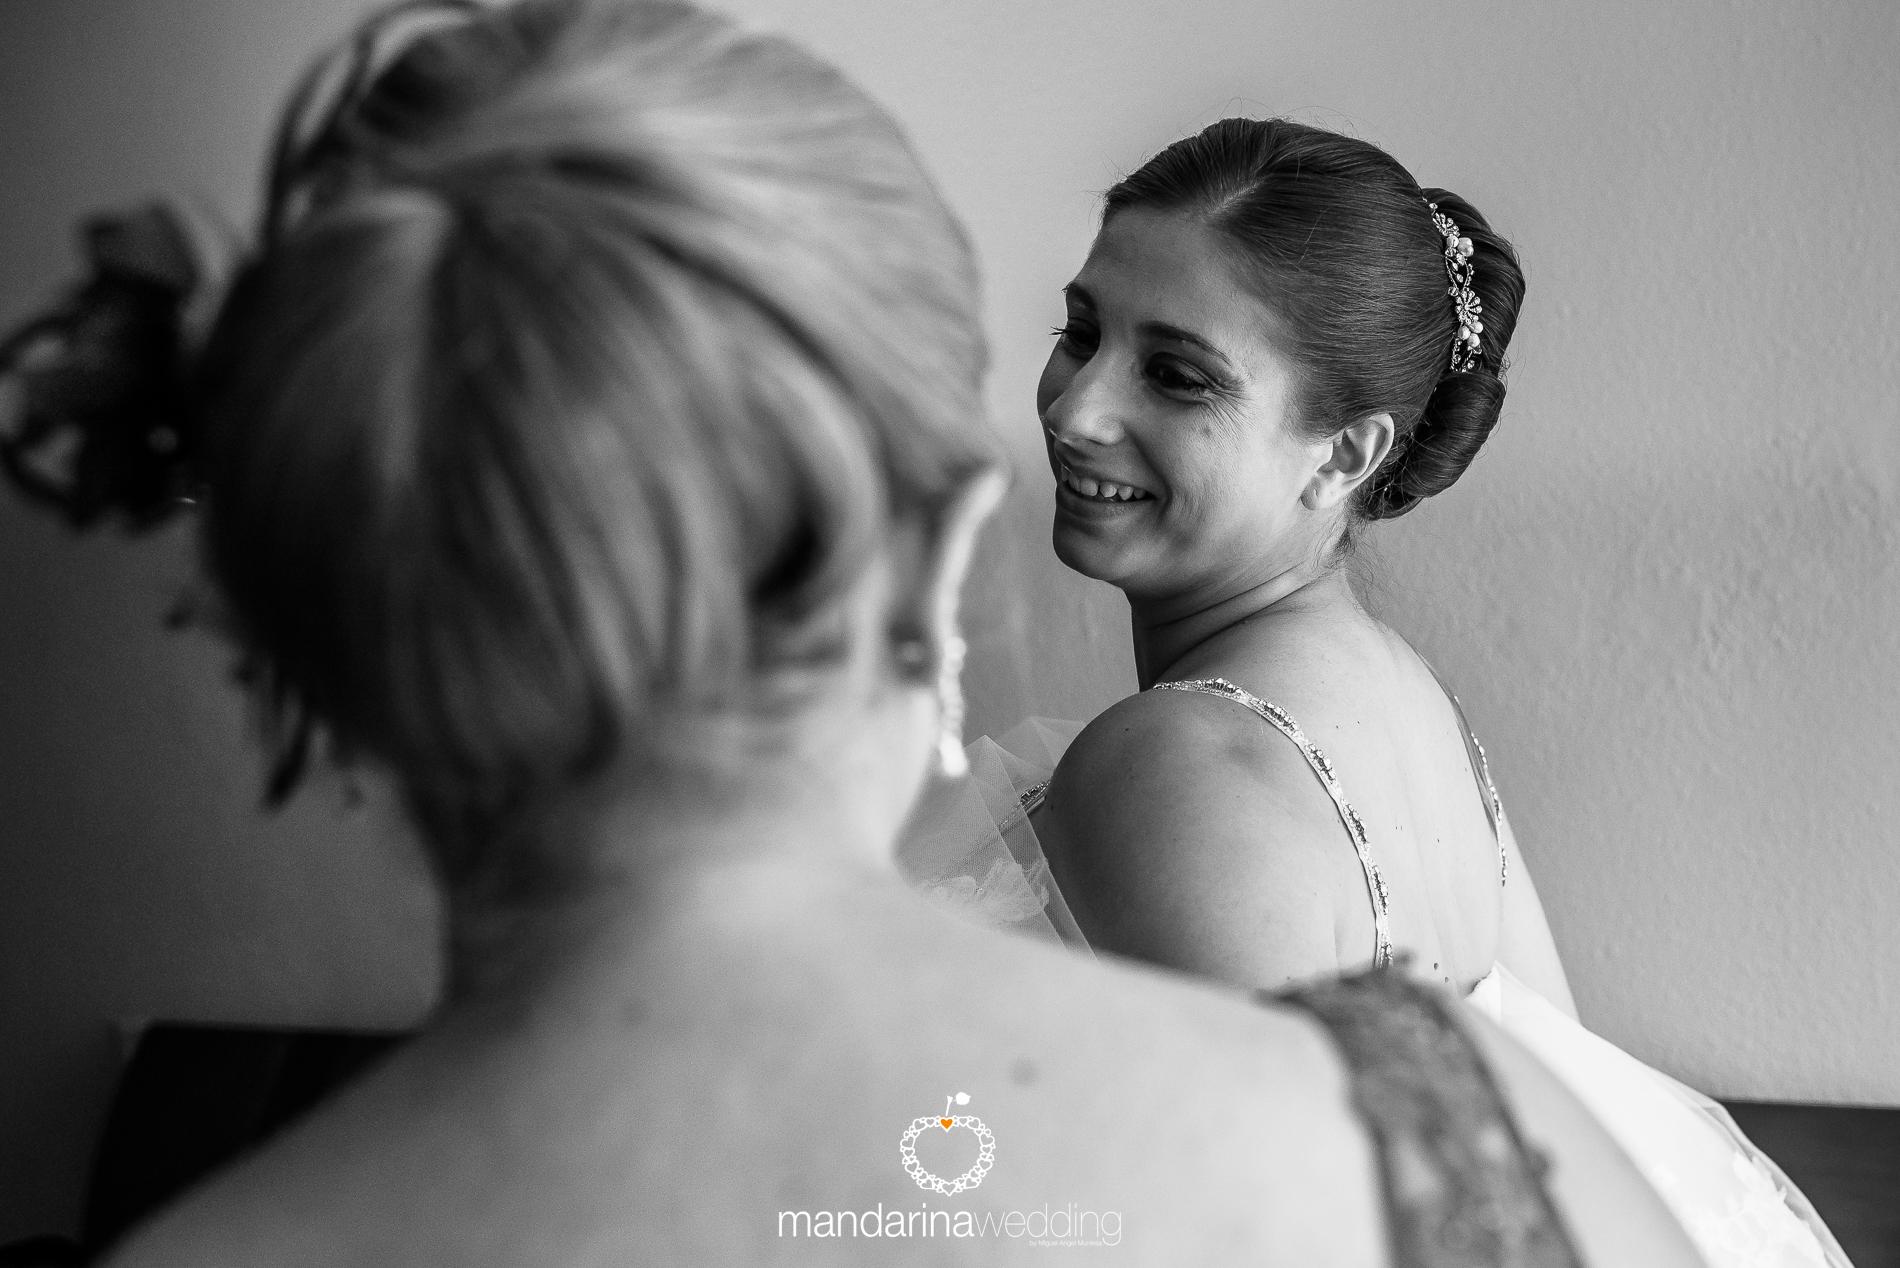 mandarina wedding, mejores fotografos boda, fotografo zaragoza, fotografo huesca, fotografo soria, fotografo lerida_40